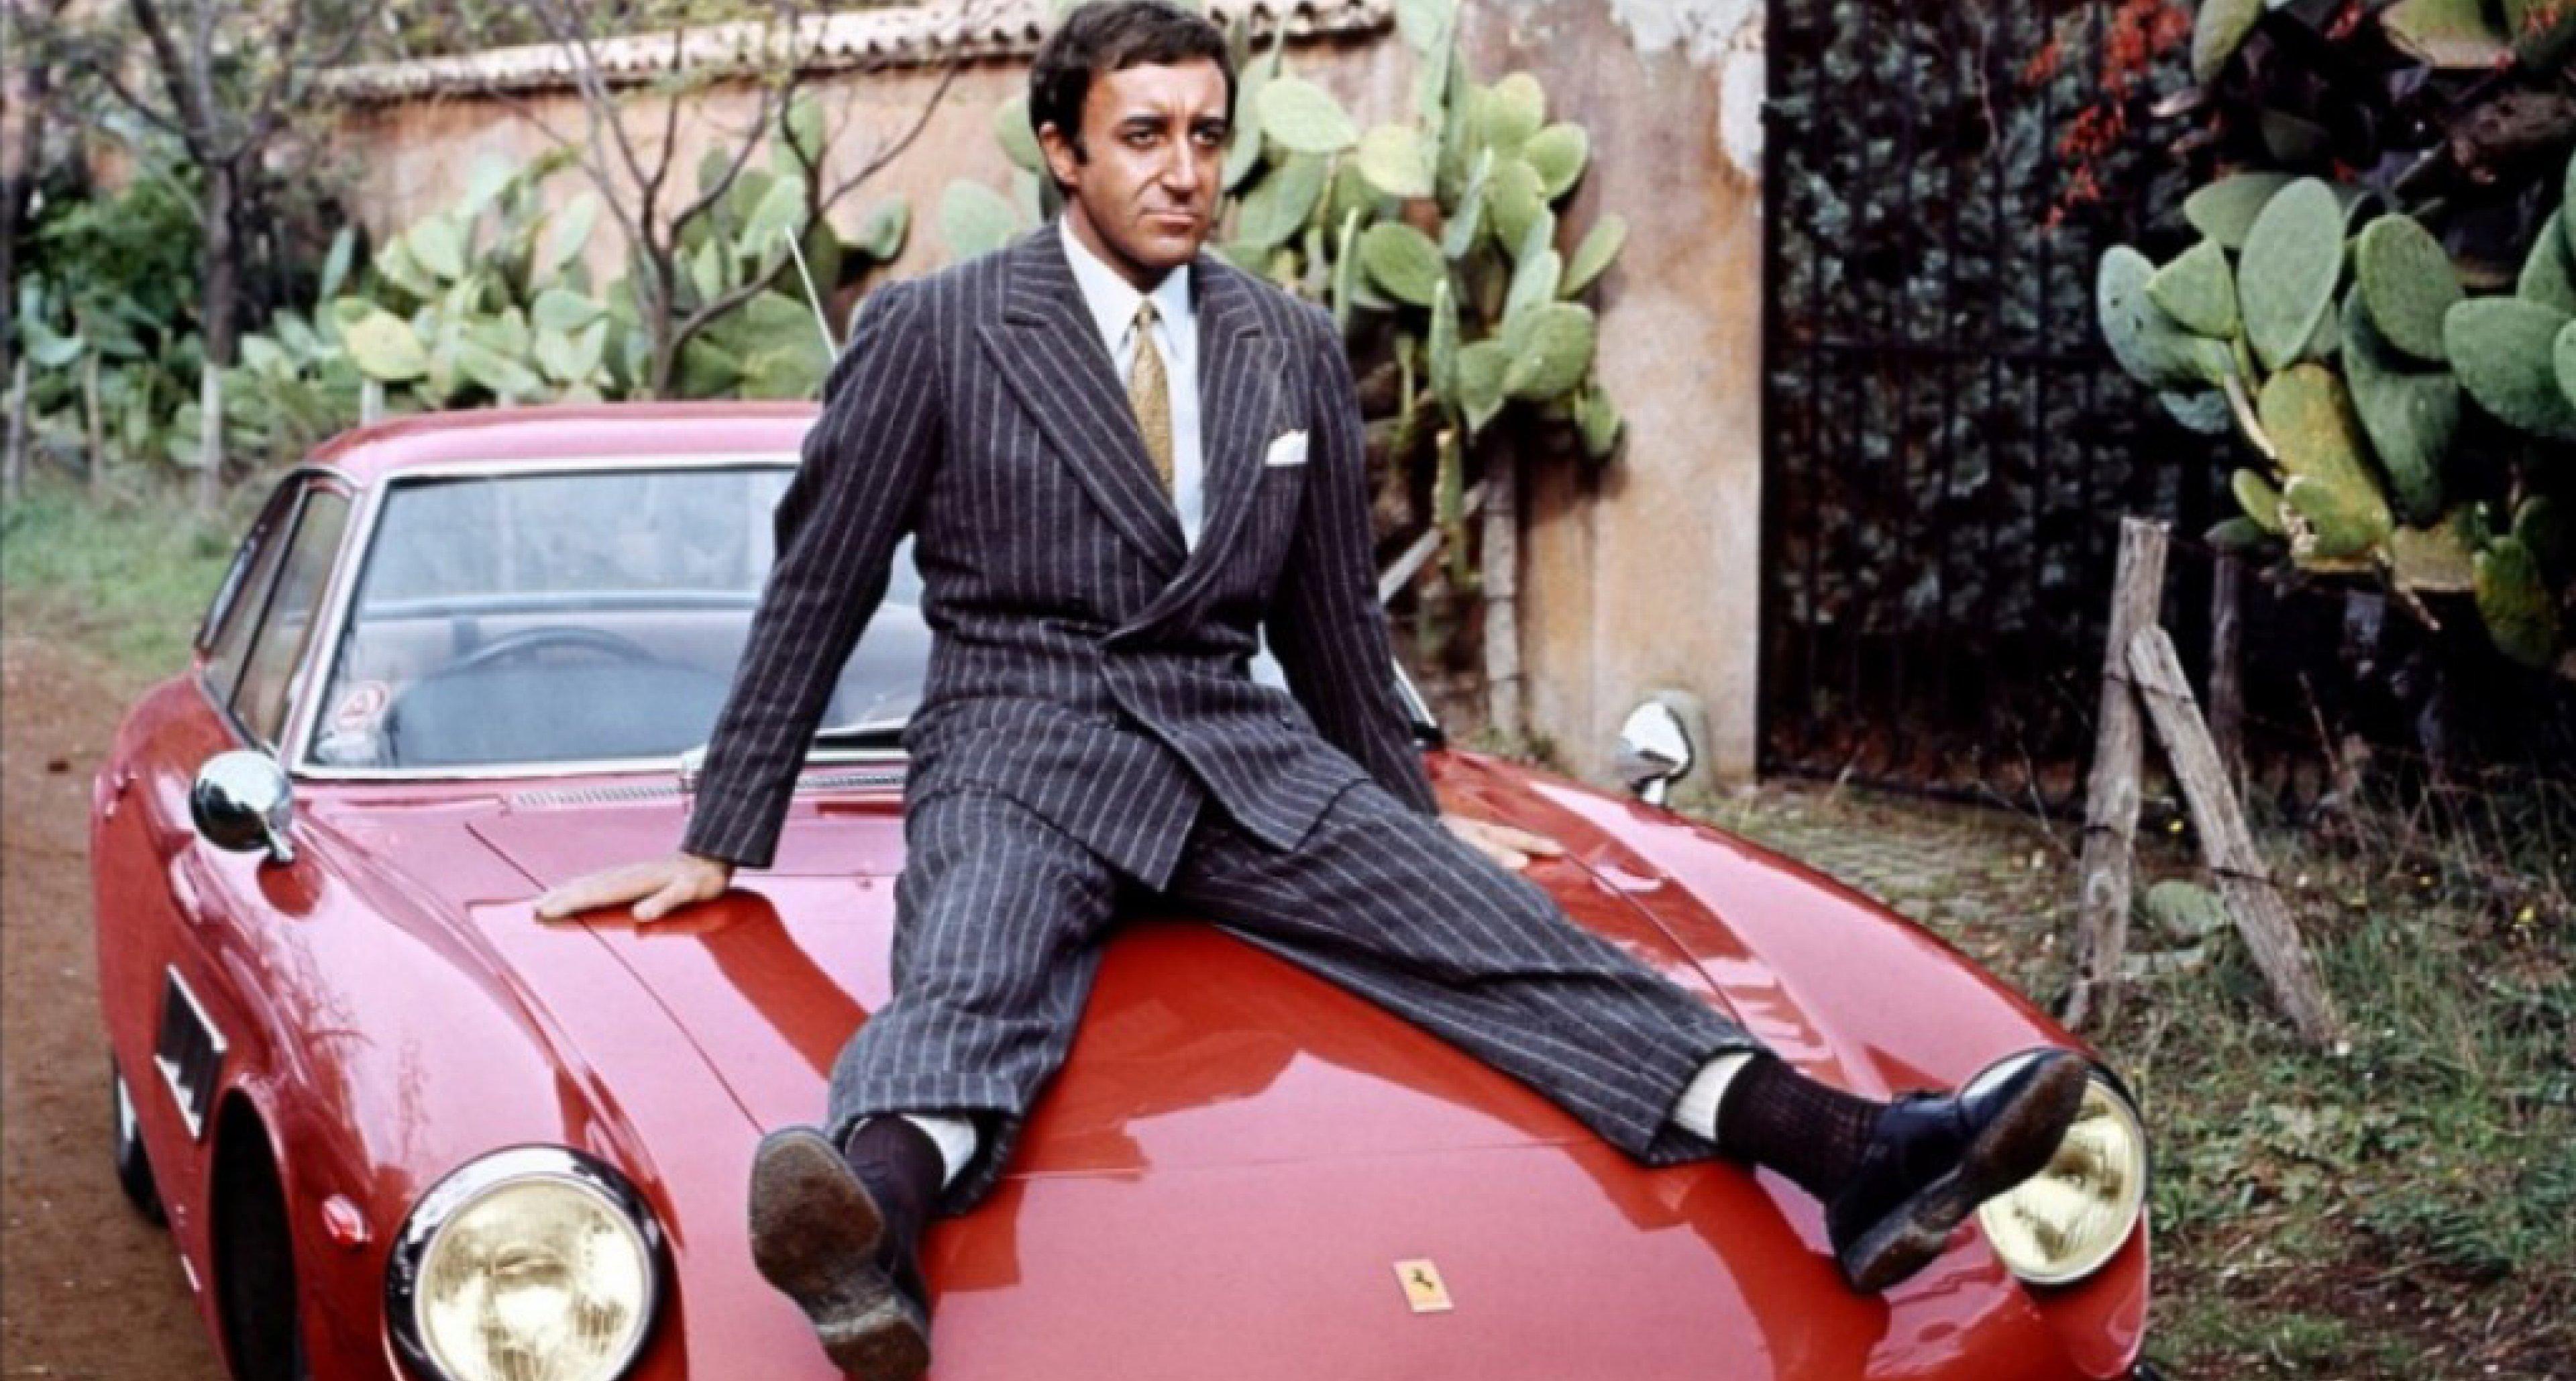 Sellers on the bonnet of his Ferrari 500 Superfast